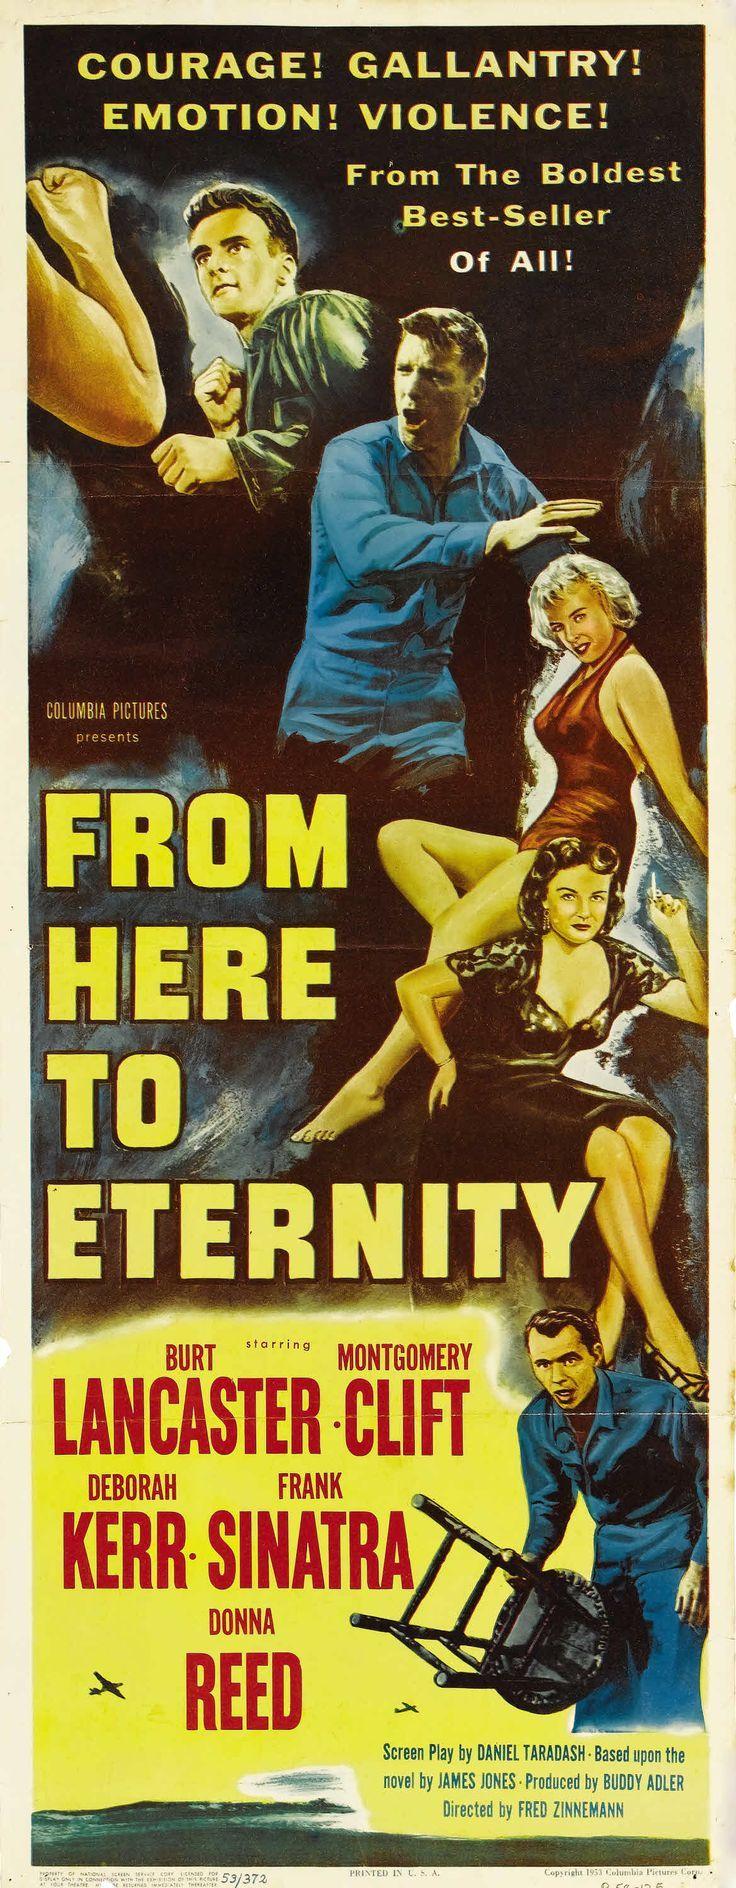 Best Film Posters From Here To Eternity De Aquí A La Eternidad 1953 Director Fred Zinnemann Dear Art Leading Art Culture Magazine Database Old Movie